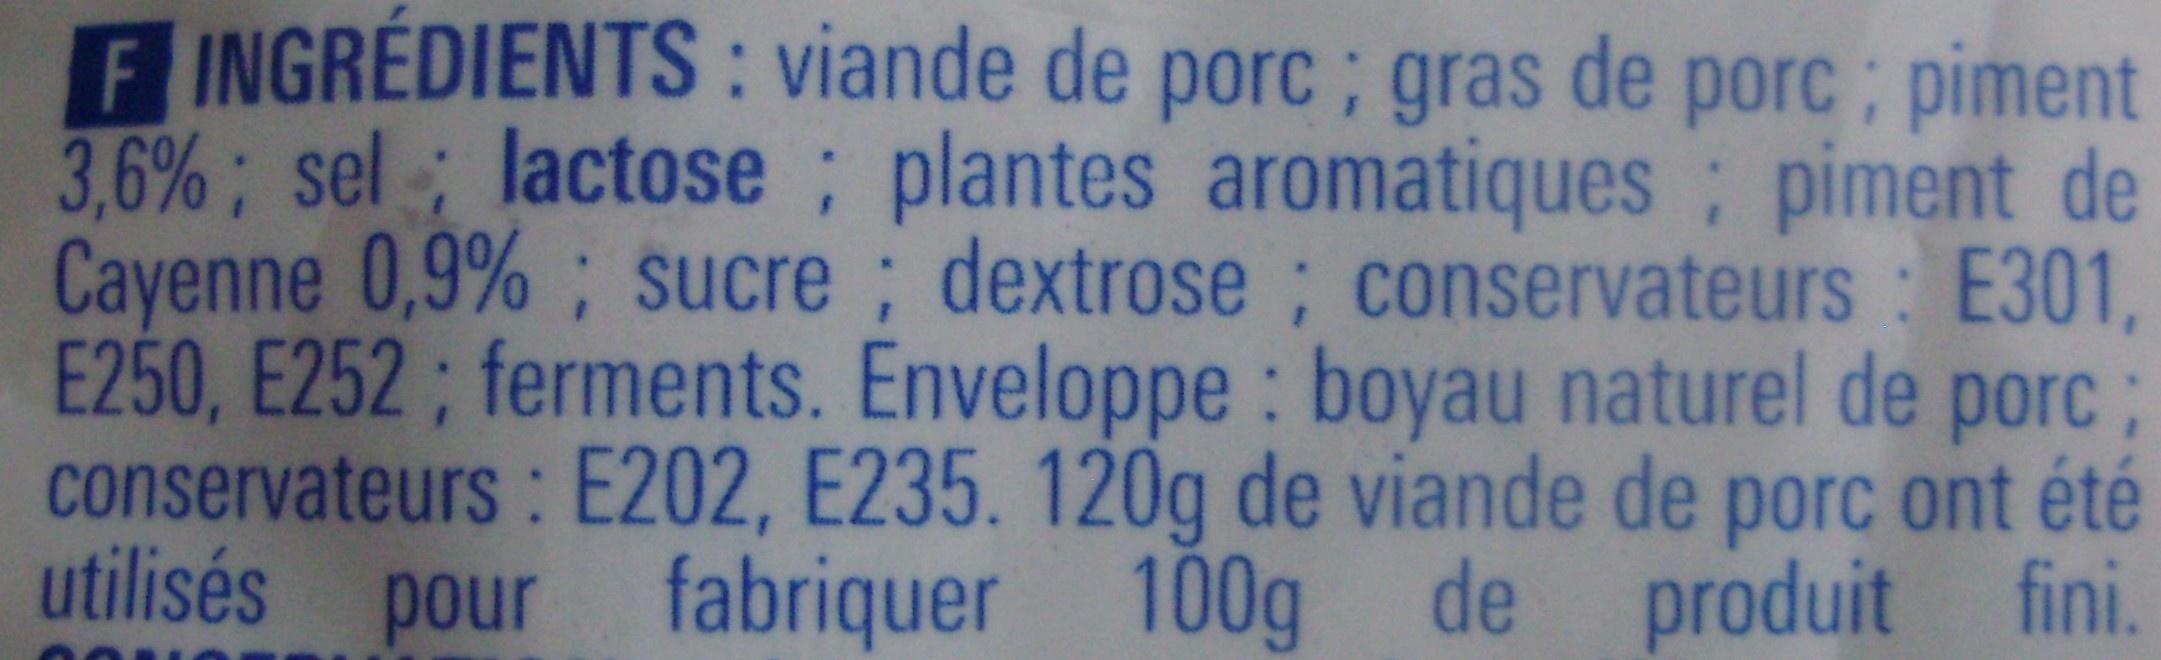 Chorizo (Fort) - Ingredients